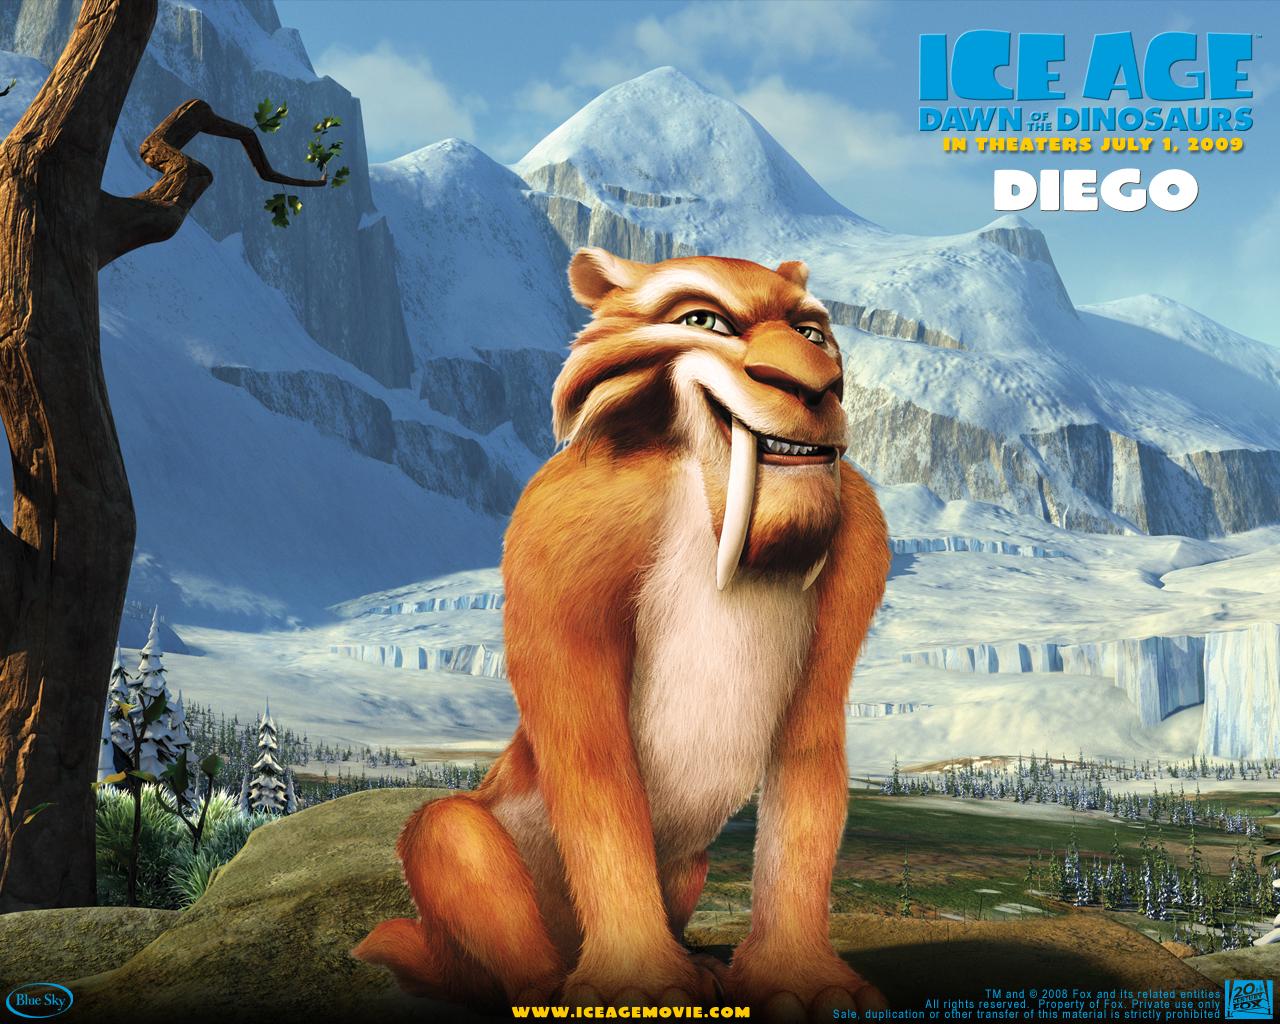 http://2.bp.blogspot.com/-TklDJS9Dfig/TfkF-xbvfaI/AAAAAAAAAEA/jO2WPxyOjAI/s1600/Cartoons+ICE+AGE+Wallpaper15.jpg